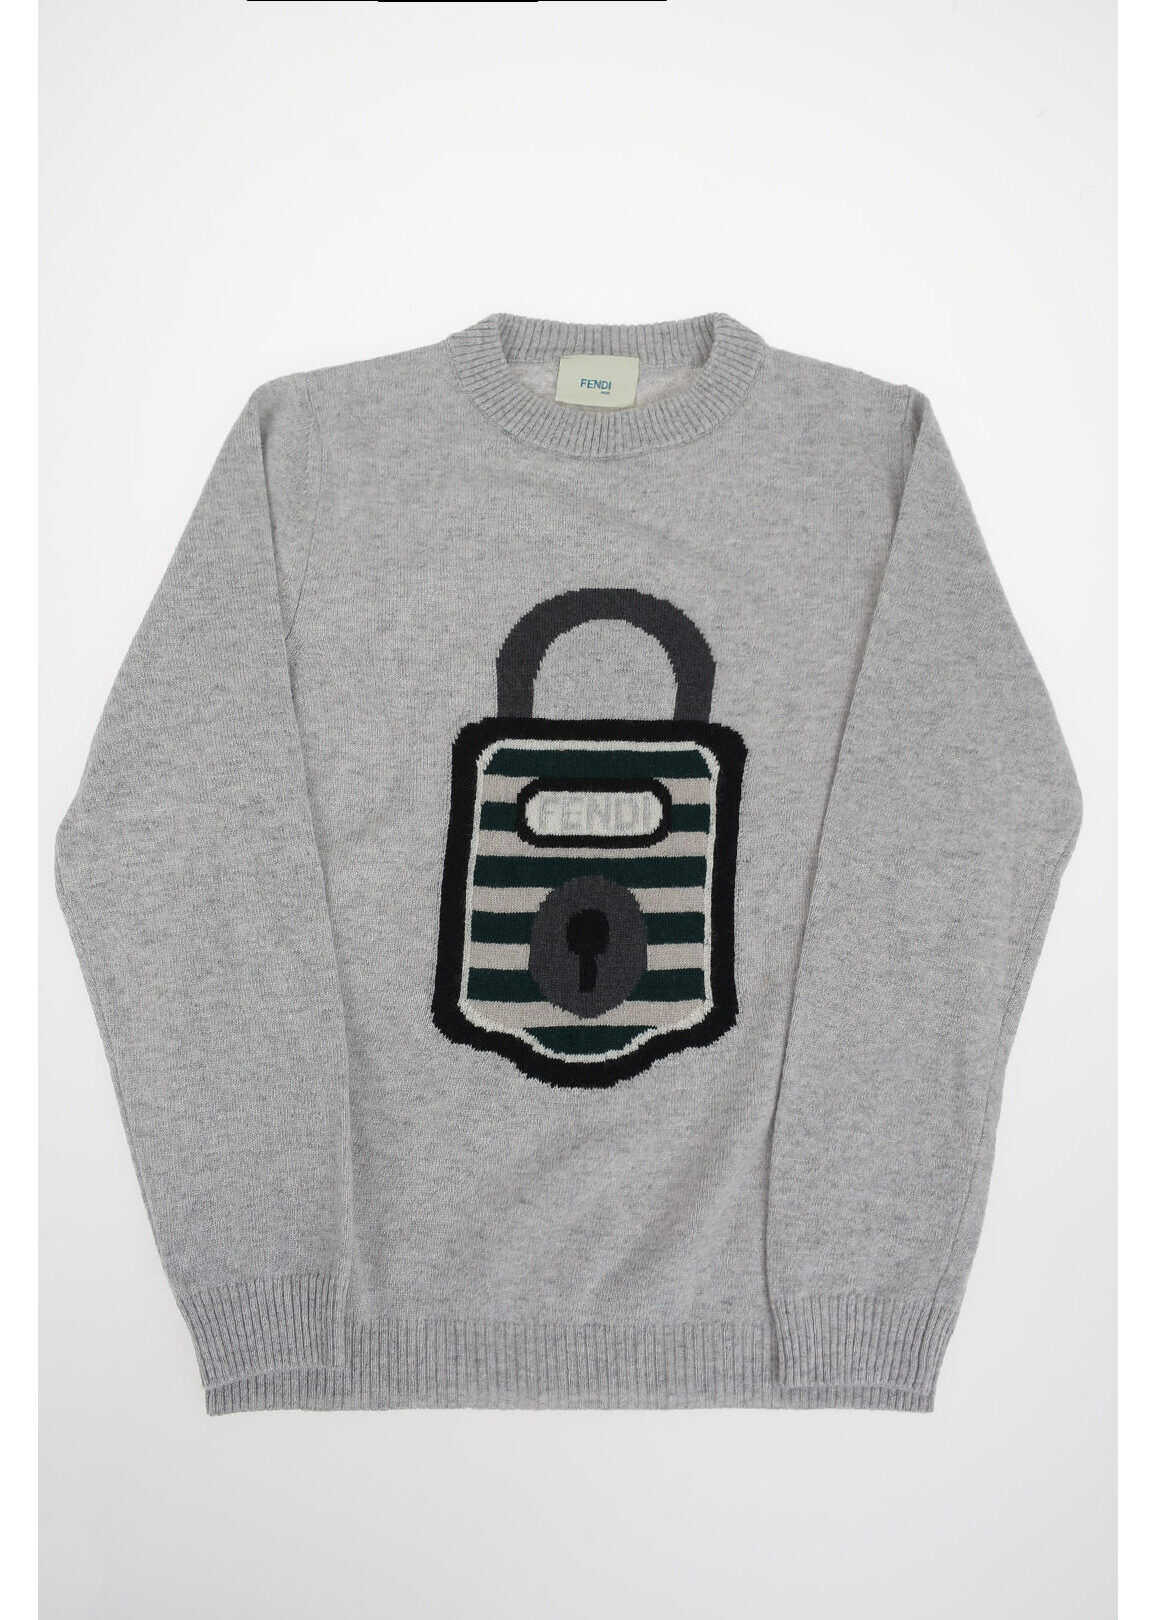 Fendi Kids embroidered crew-neck sweater GRAY